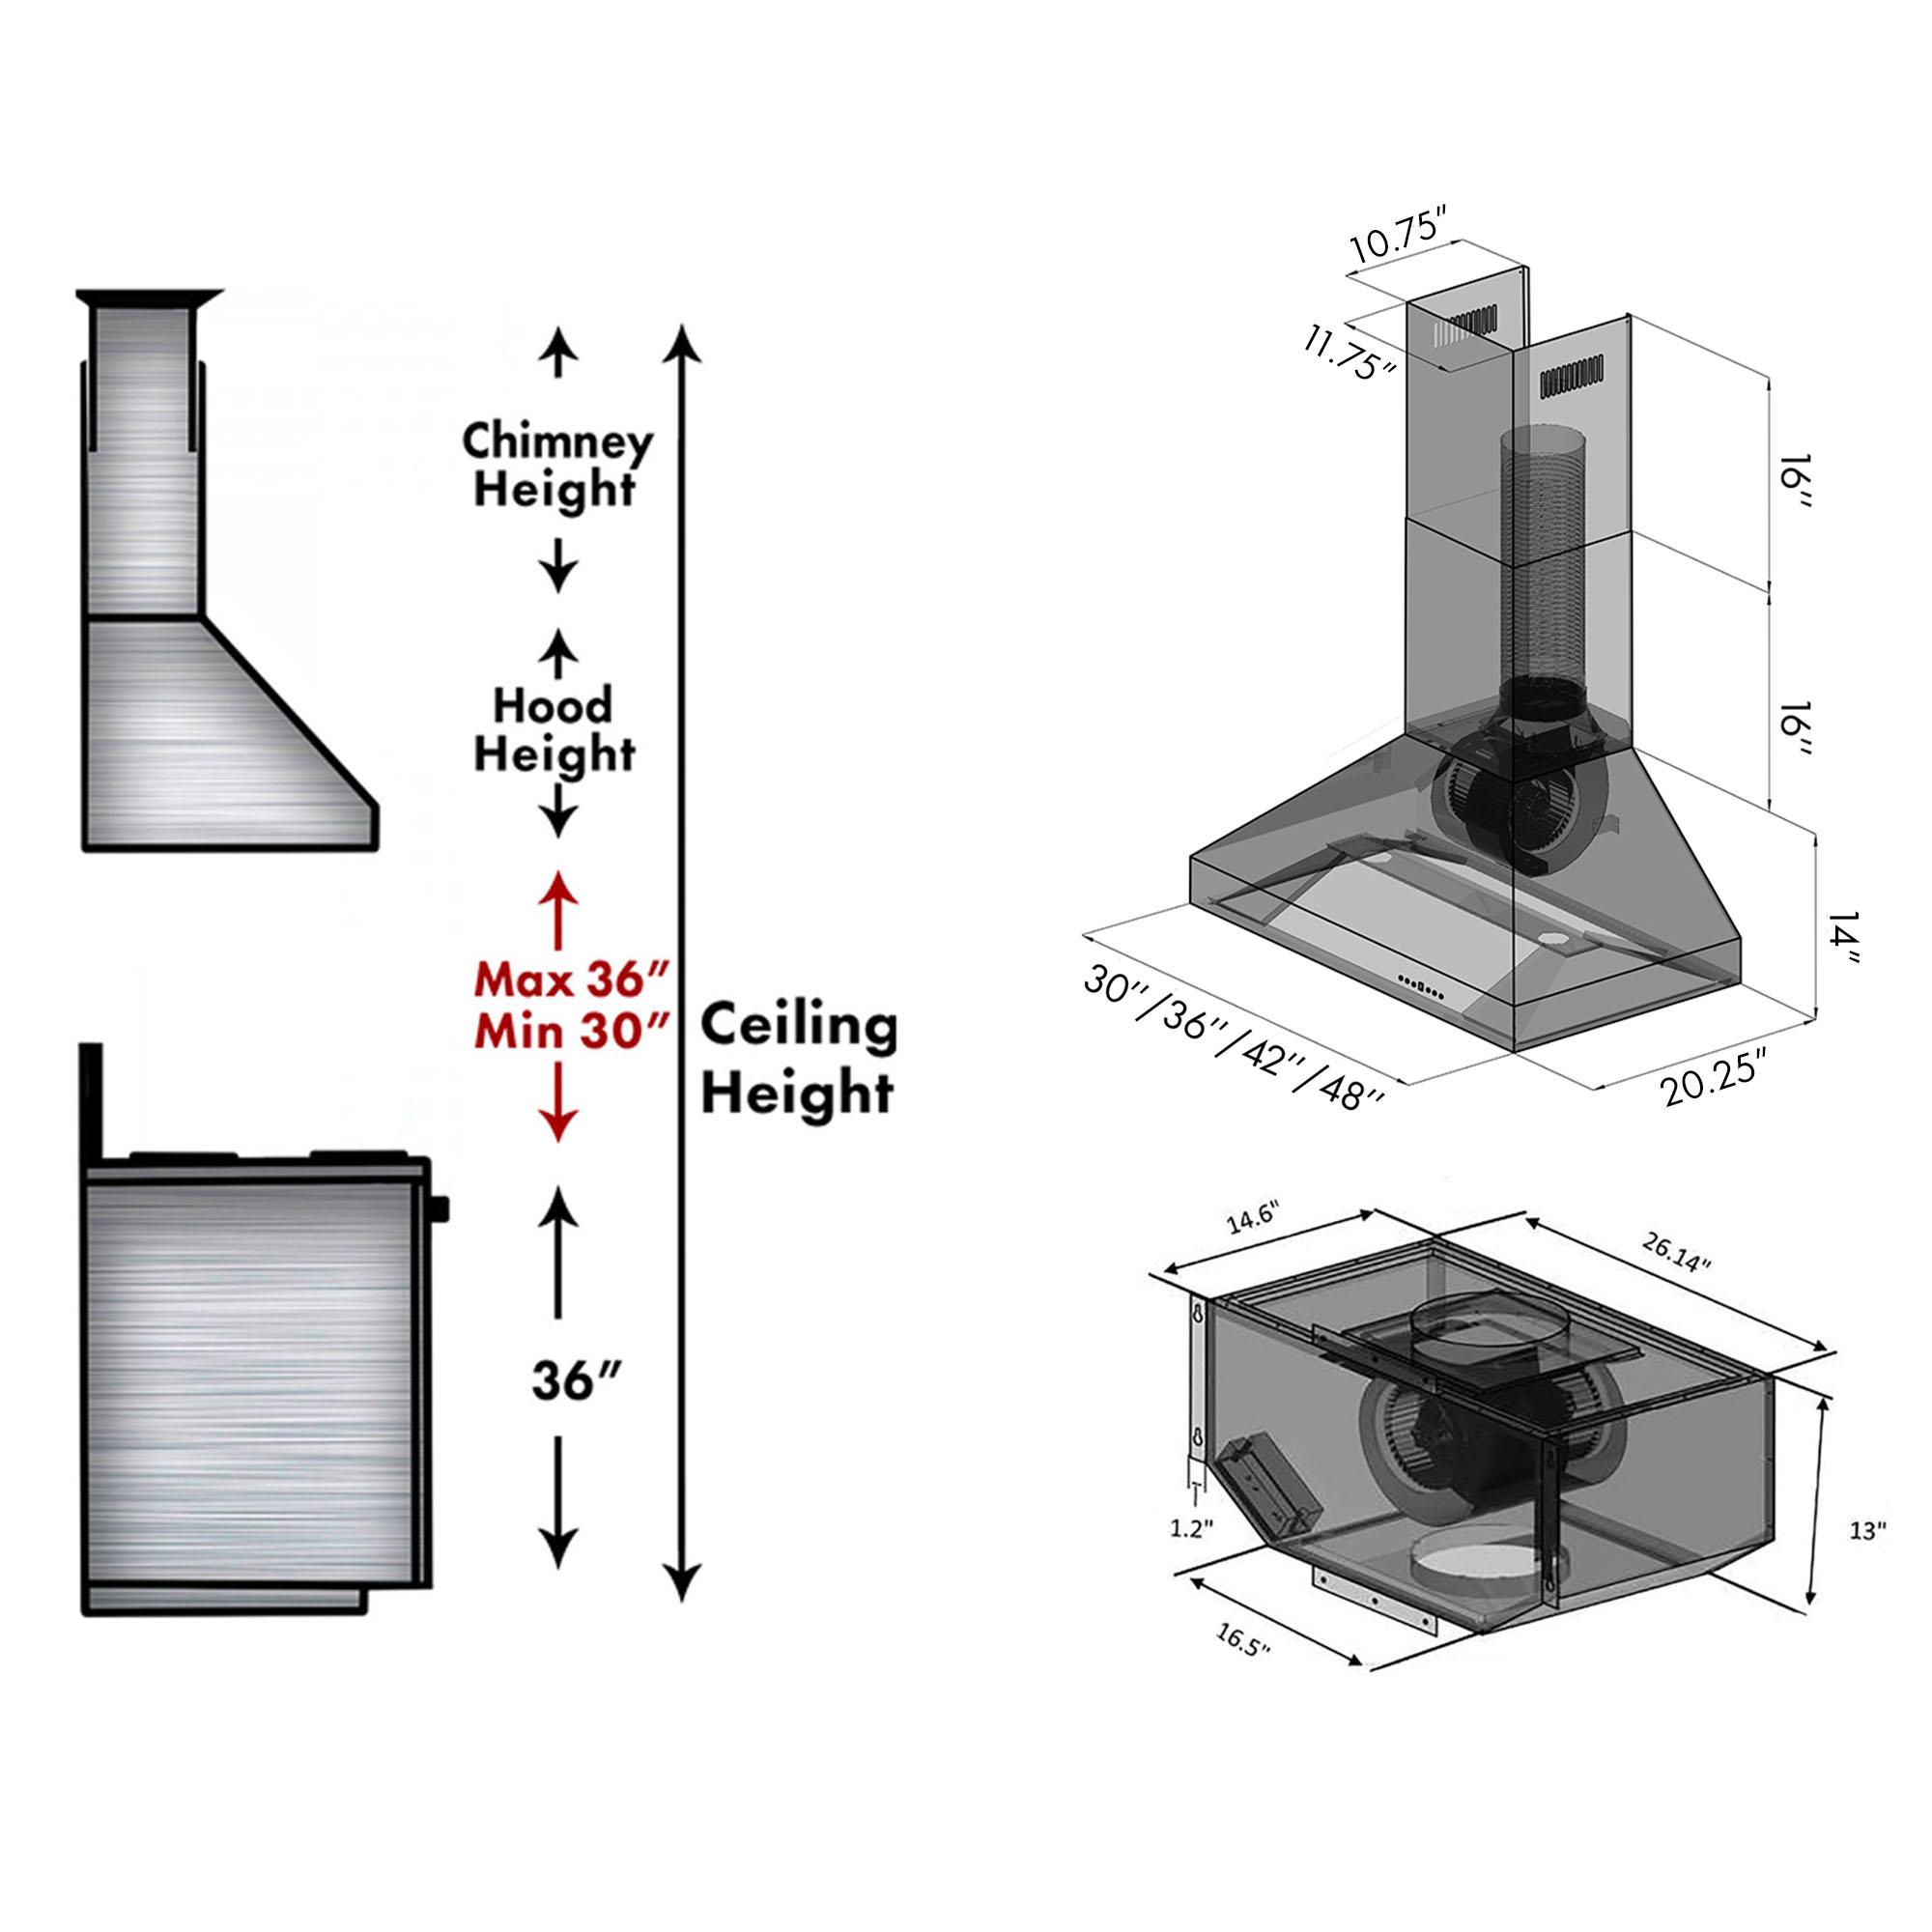 zline-stainless-steel-wall-mounted-range-hood-597-R-graphic-new.jpg